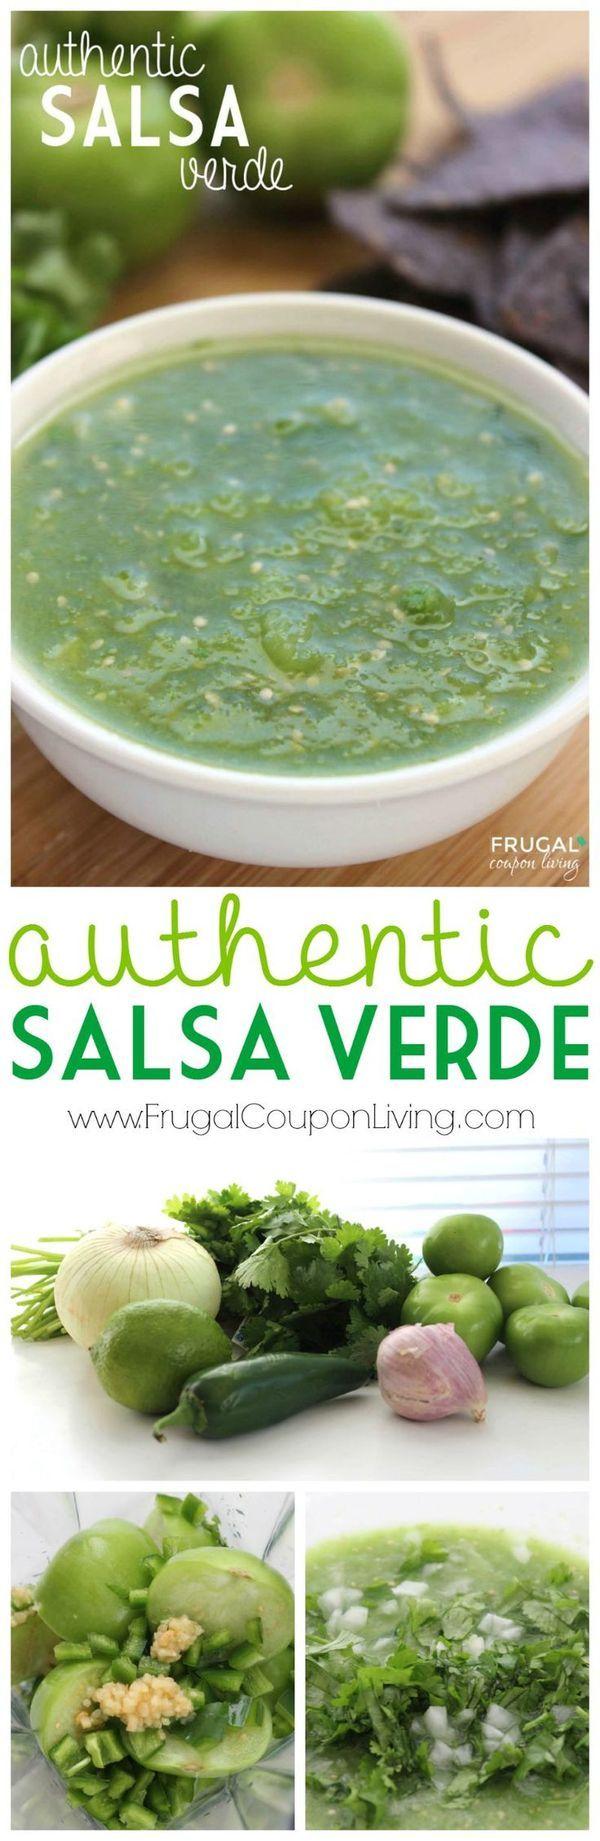 Salsa Verde - Authentic Mexican Salsa